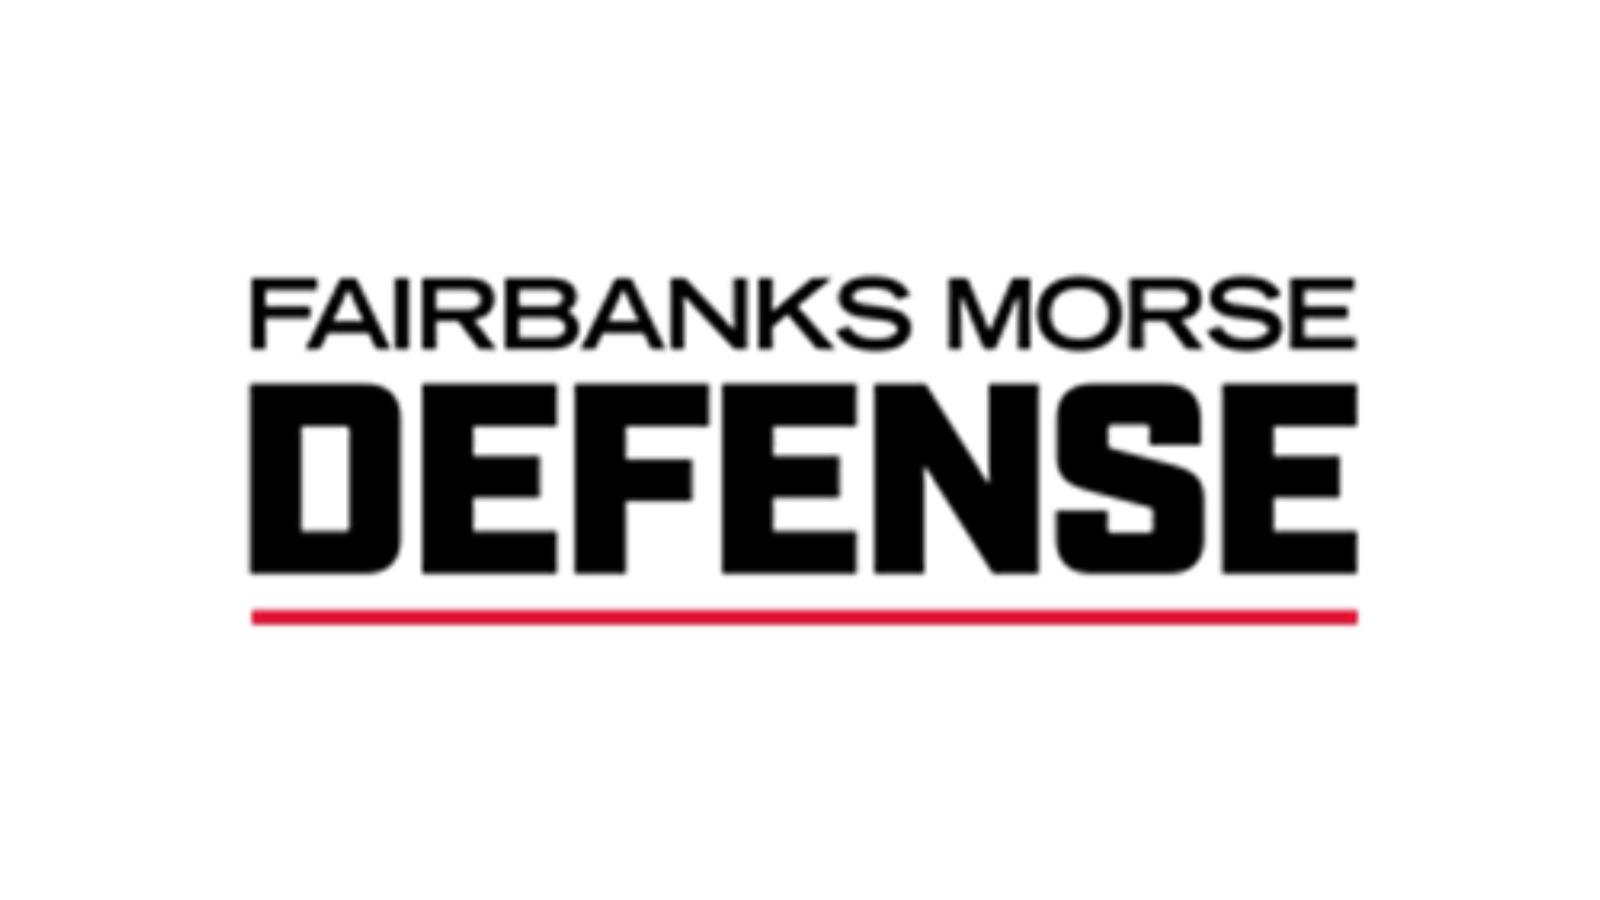 Fairbanks Morse is now Fairbanks Morse Defense